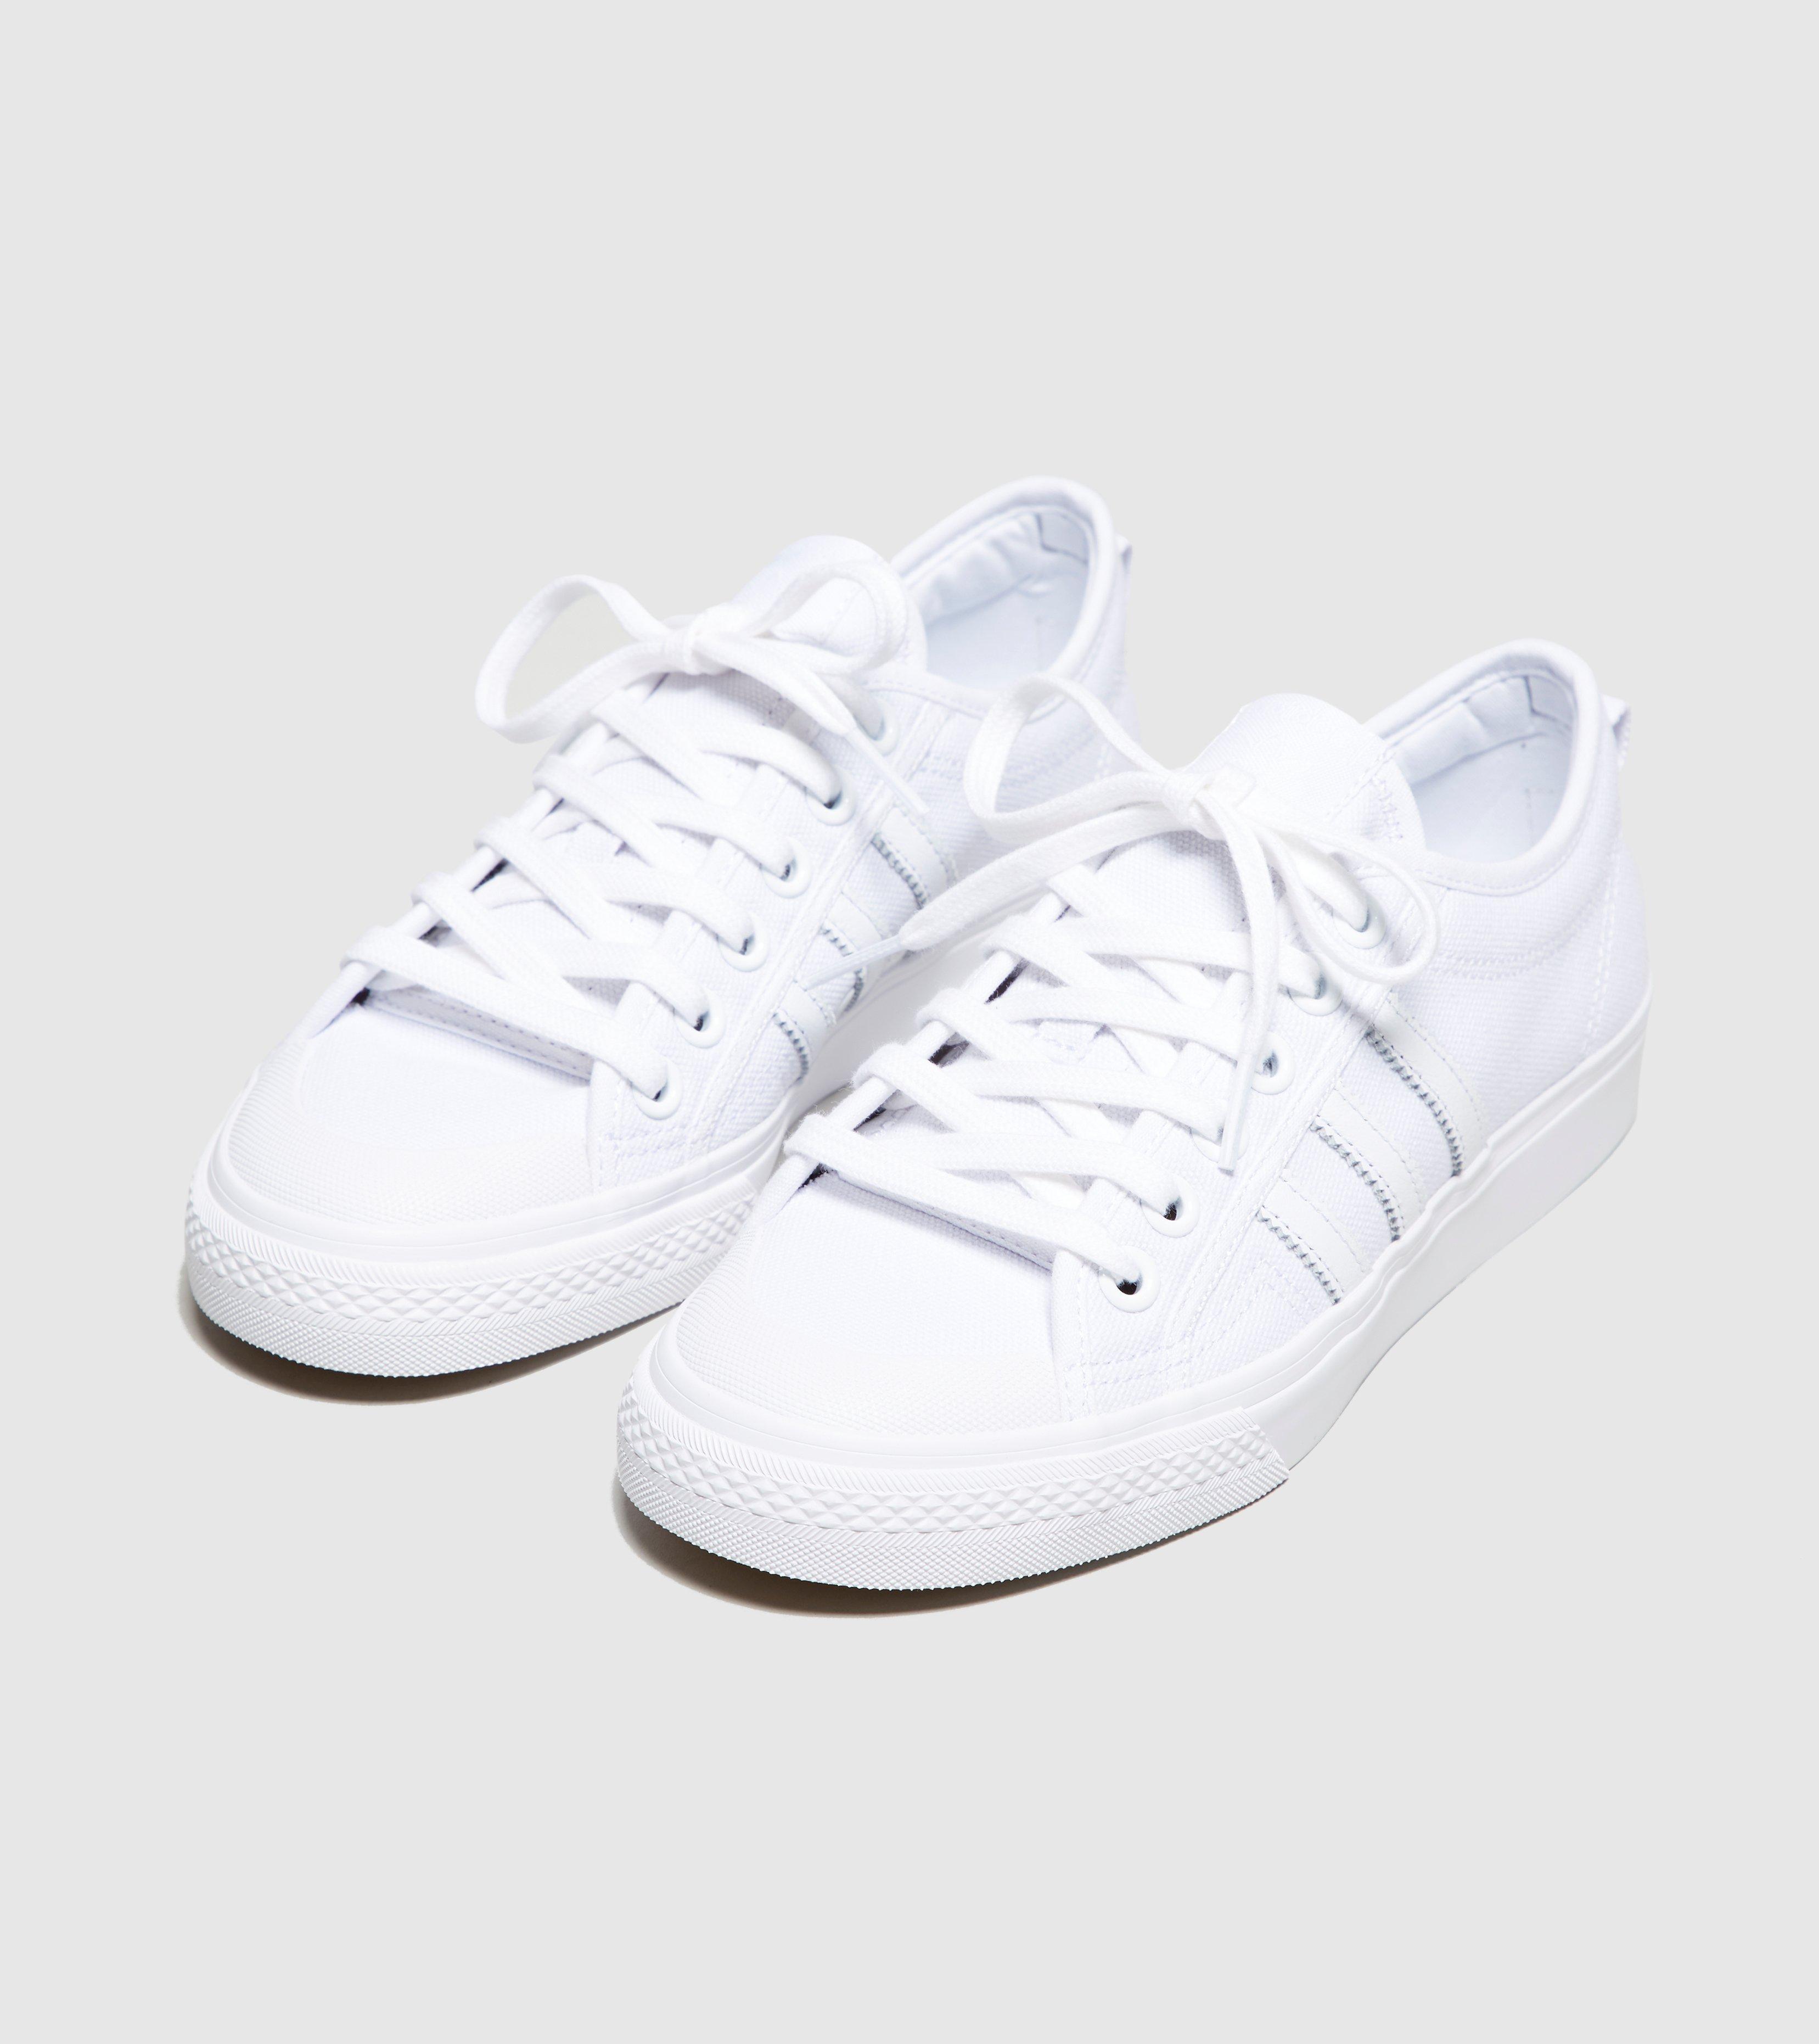 Lyst - adidas Originals Nizza Women s in White f9038909d